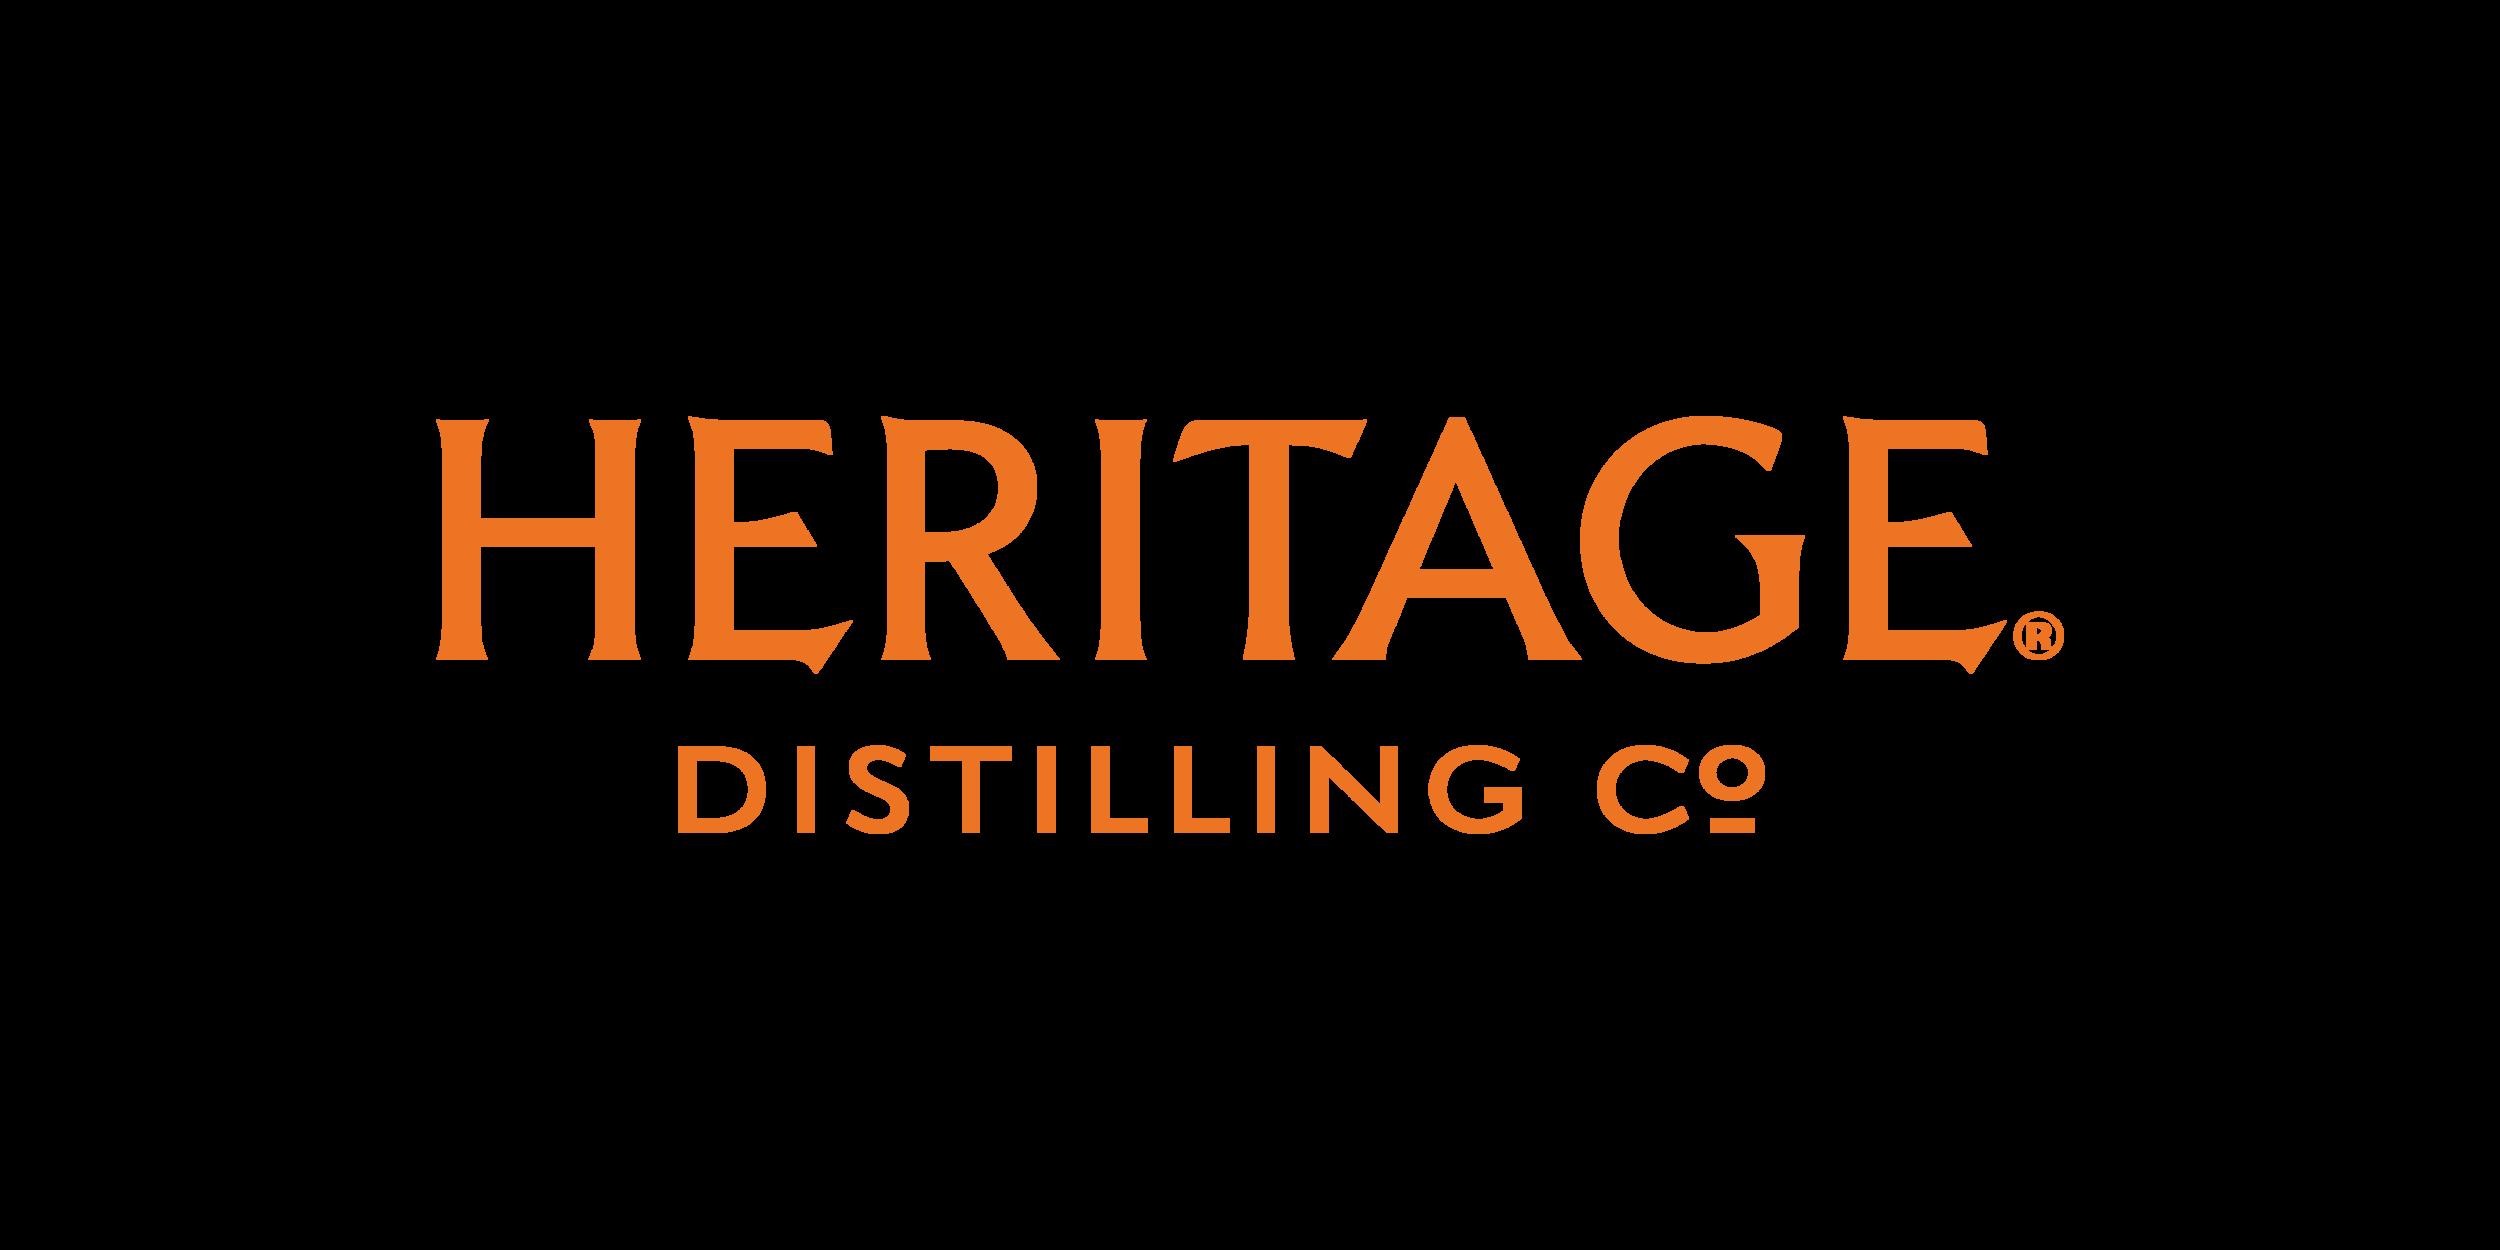 Heritage_Wordmark_Orange.png